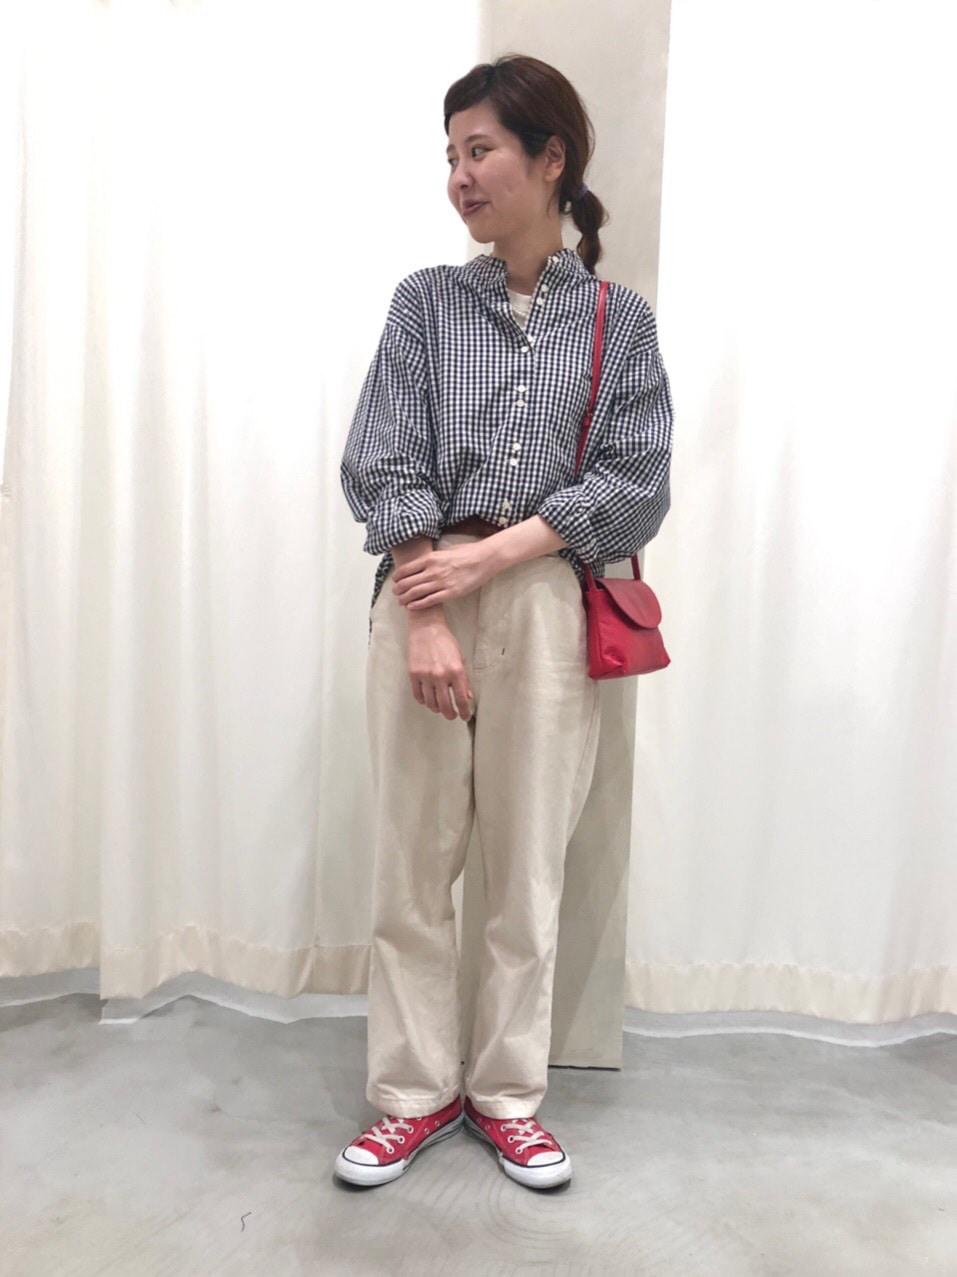 AMB SHOP CHILD WOMAN CHILD WOMAN , PAR ICI 東京スカイツリータウン・ソラマチ 身長:160cm 2020.07.28